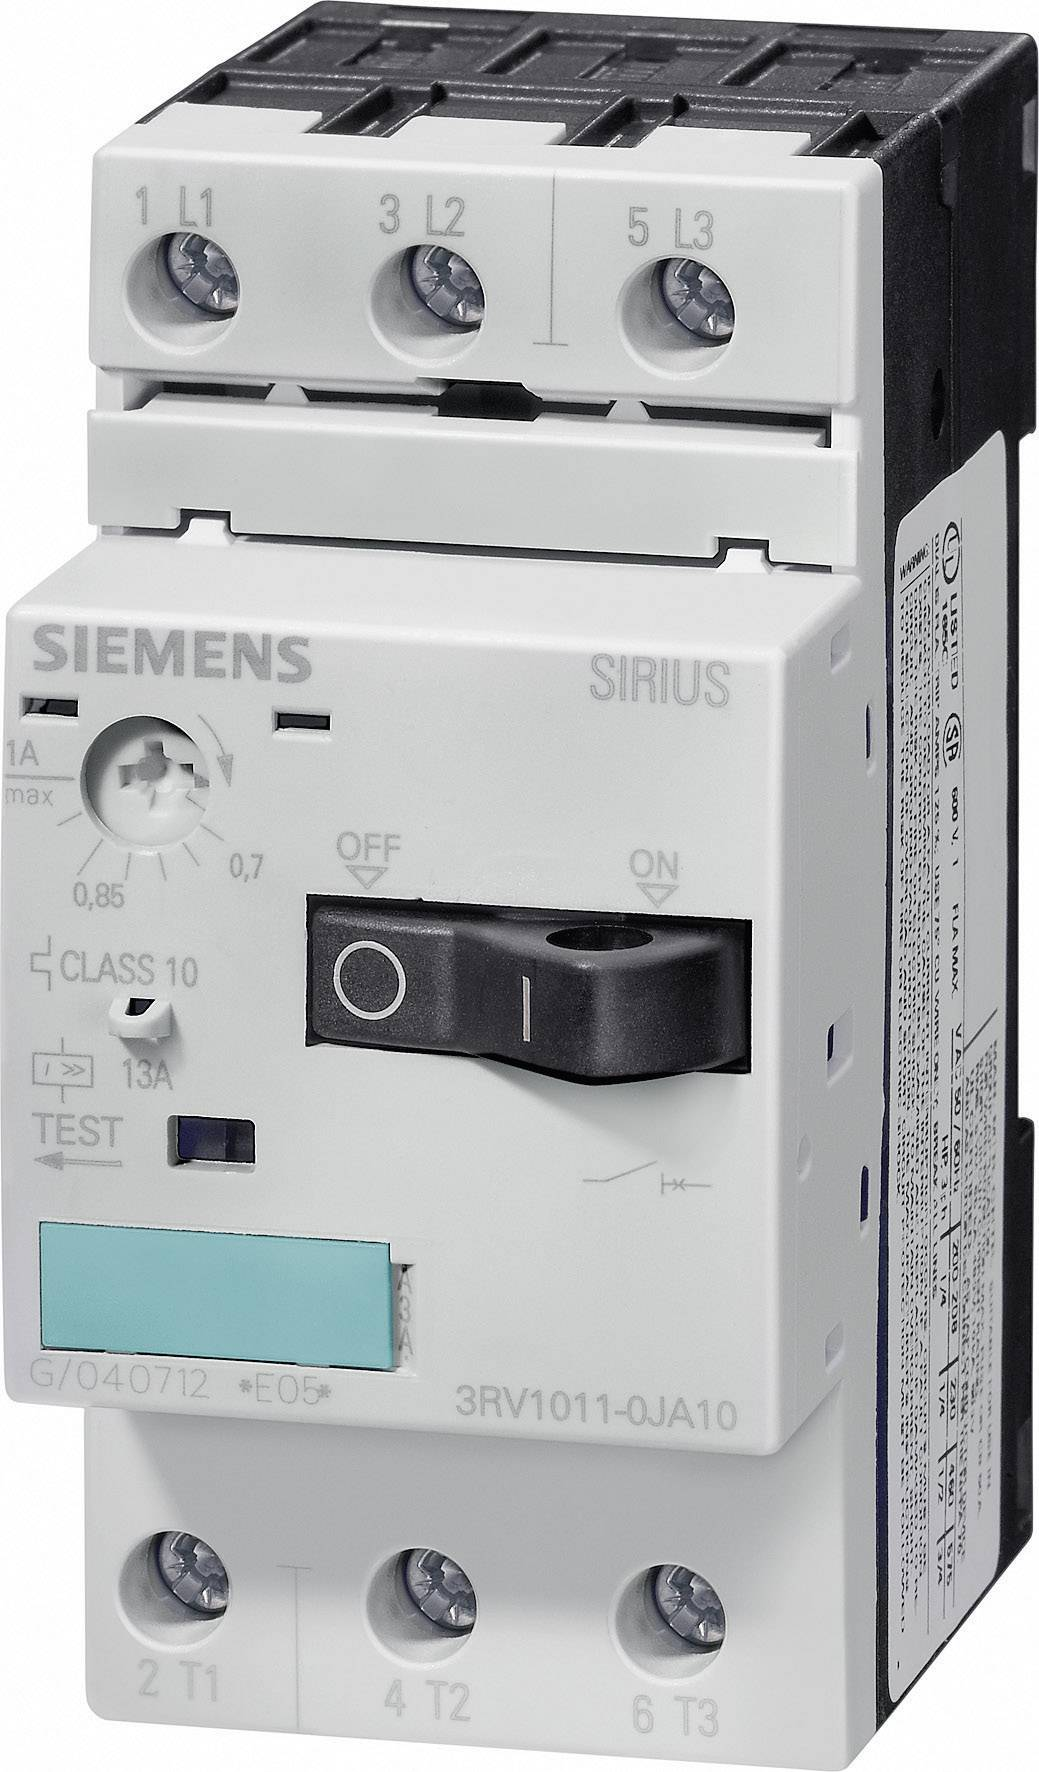 SIEMENS SIRIUS 3R 4.5-6.3A MOTOR STARTER SWITCH 3RV1011-1GA10